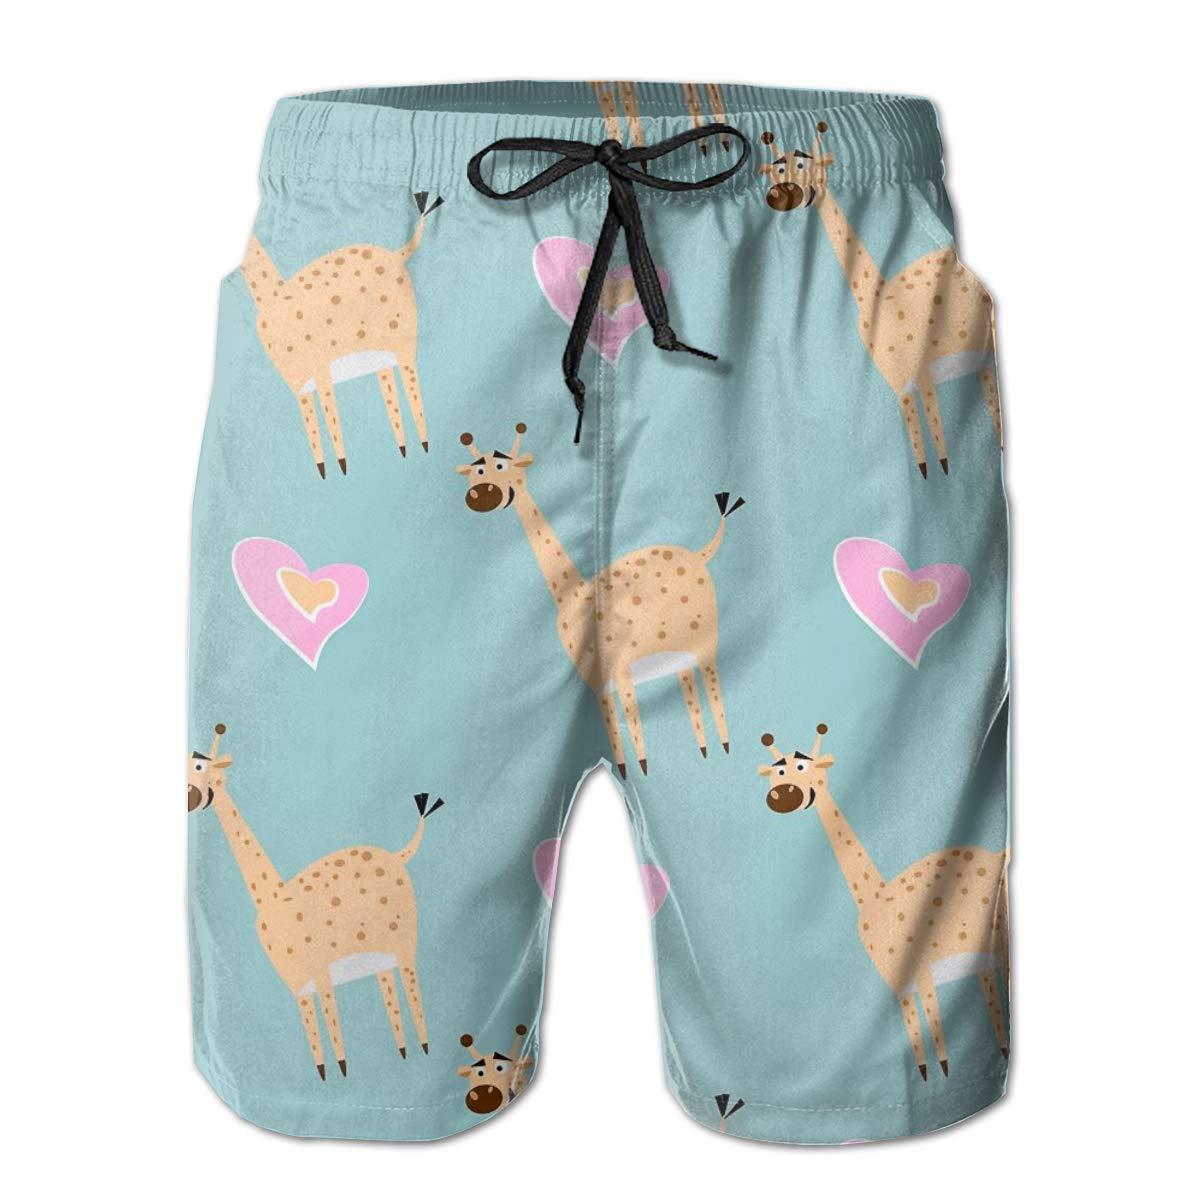 SARA NELL Mens Swim Trunks Pattern with Cute Giraffe and Heart Surfing Beach Board Shorts Swimwear